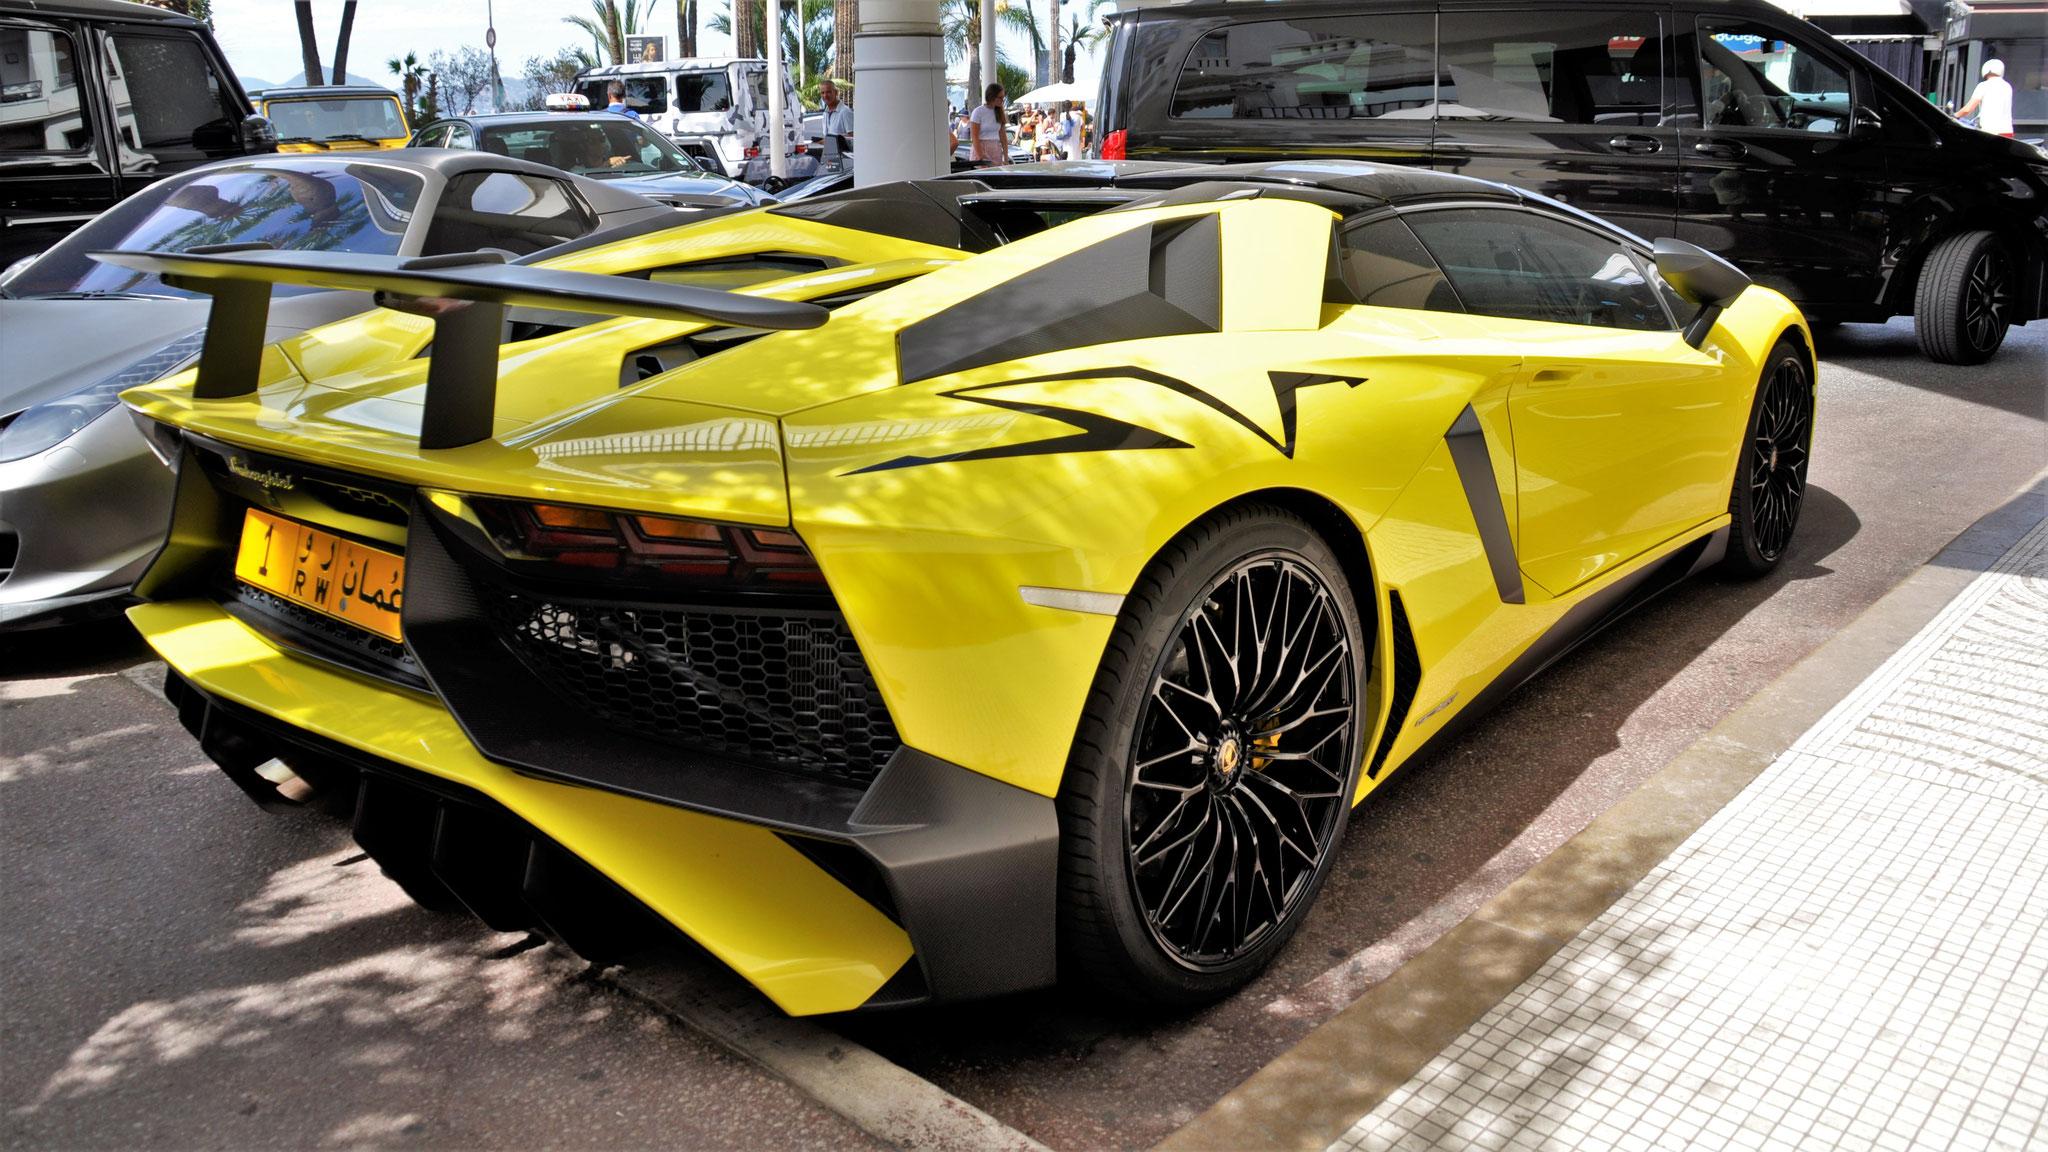 Lamborghini Aventador LP-750-4 SV Roadster - 1-RW (OM)